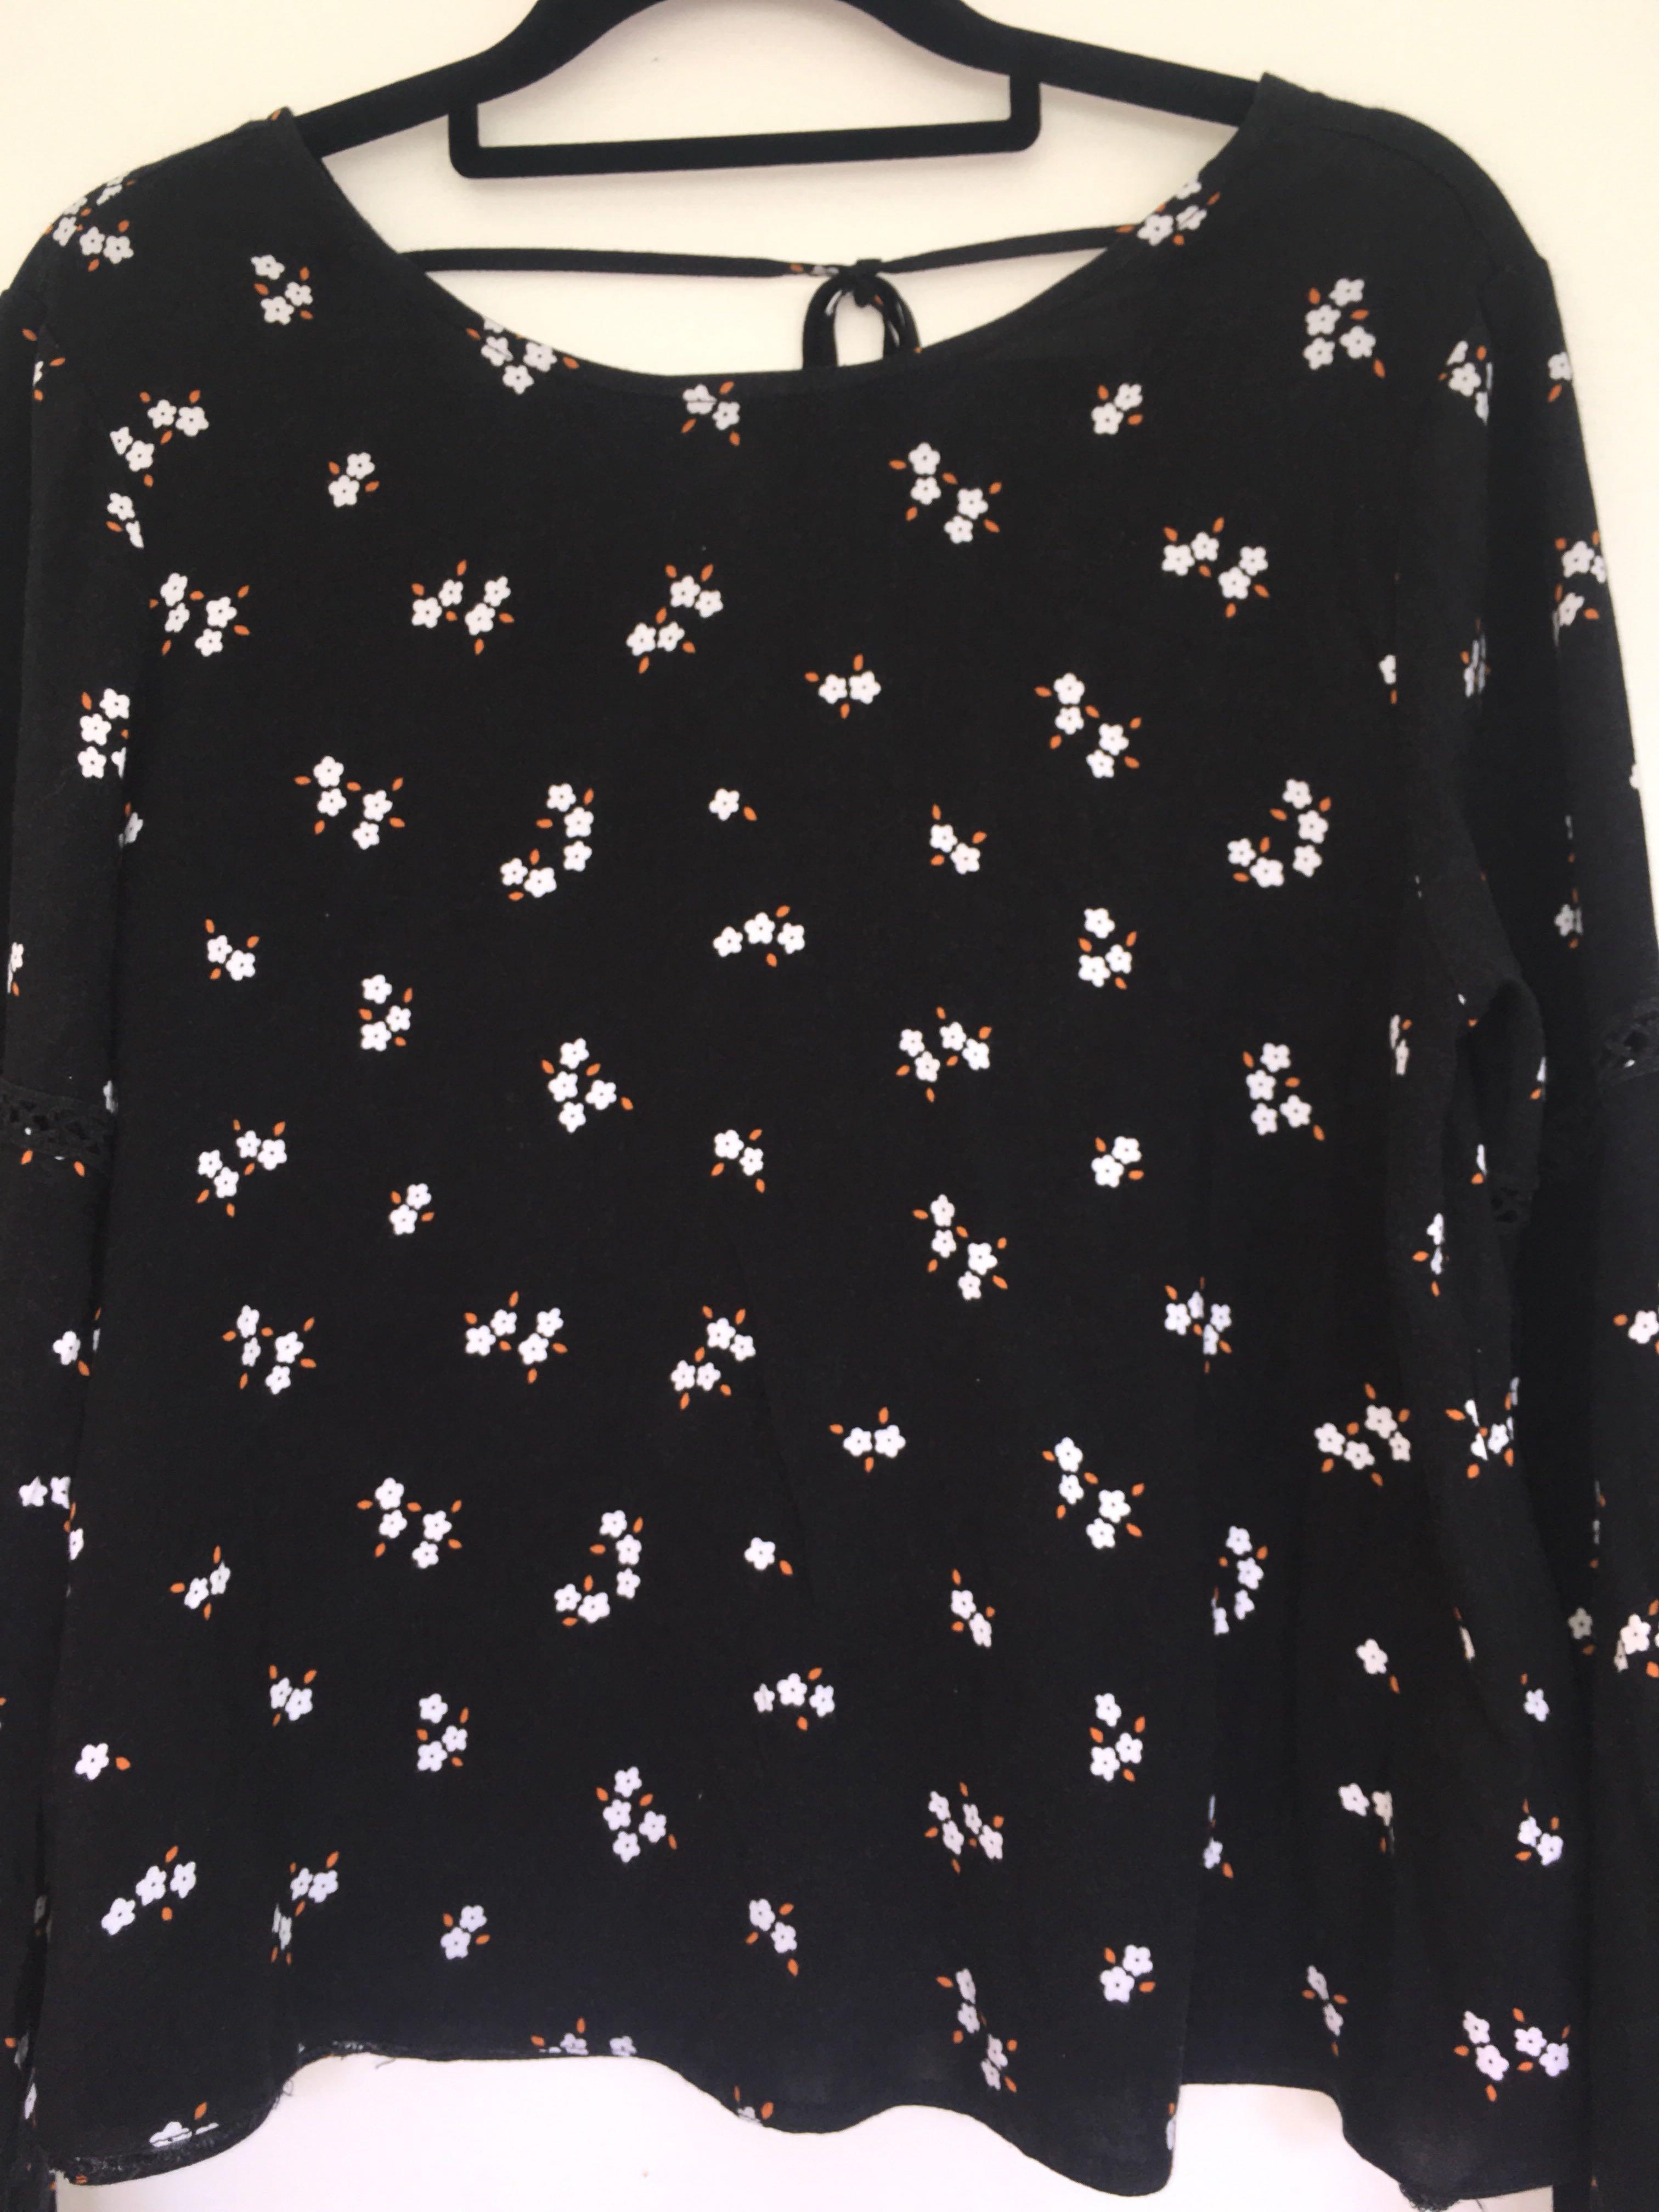 Black long sleeve - size S